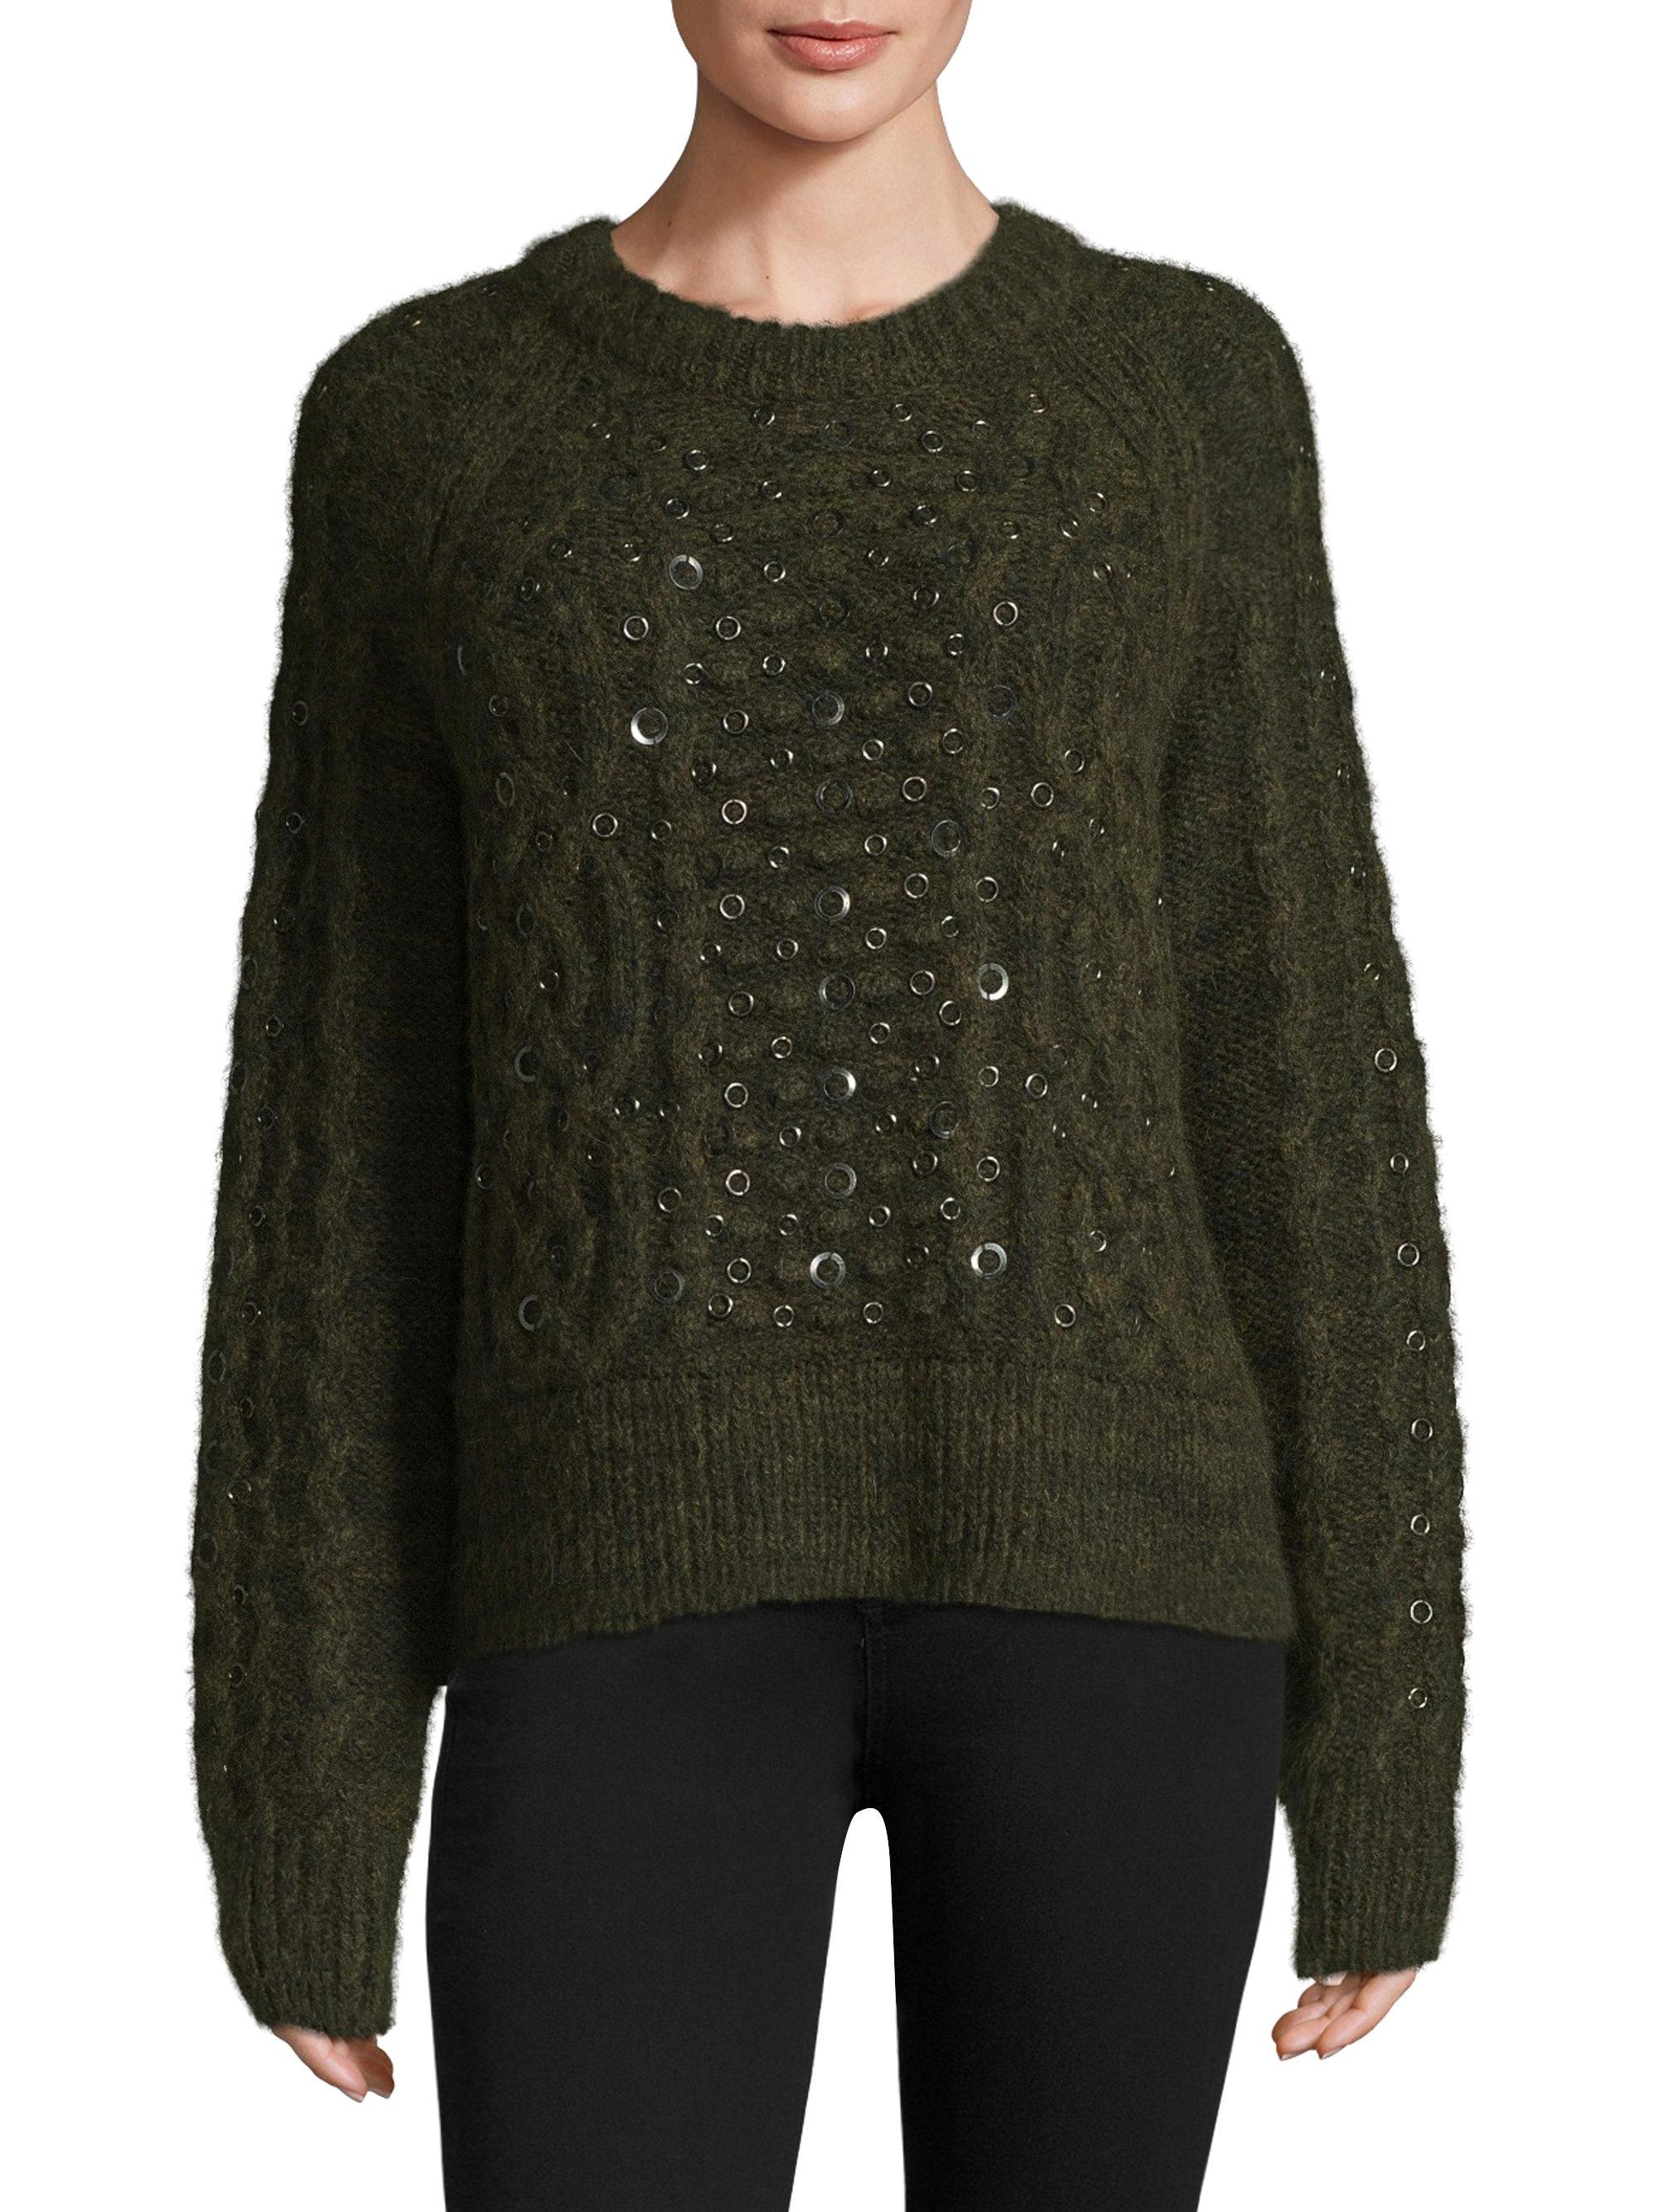 Lyst In Green Jemima amp; Rag Embellished Sweater Bone 8RzHF8g